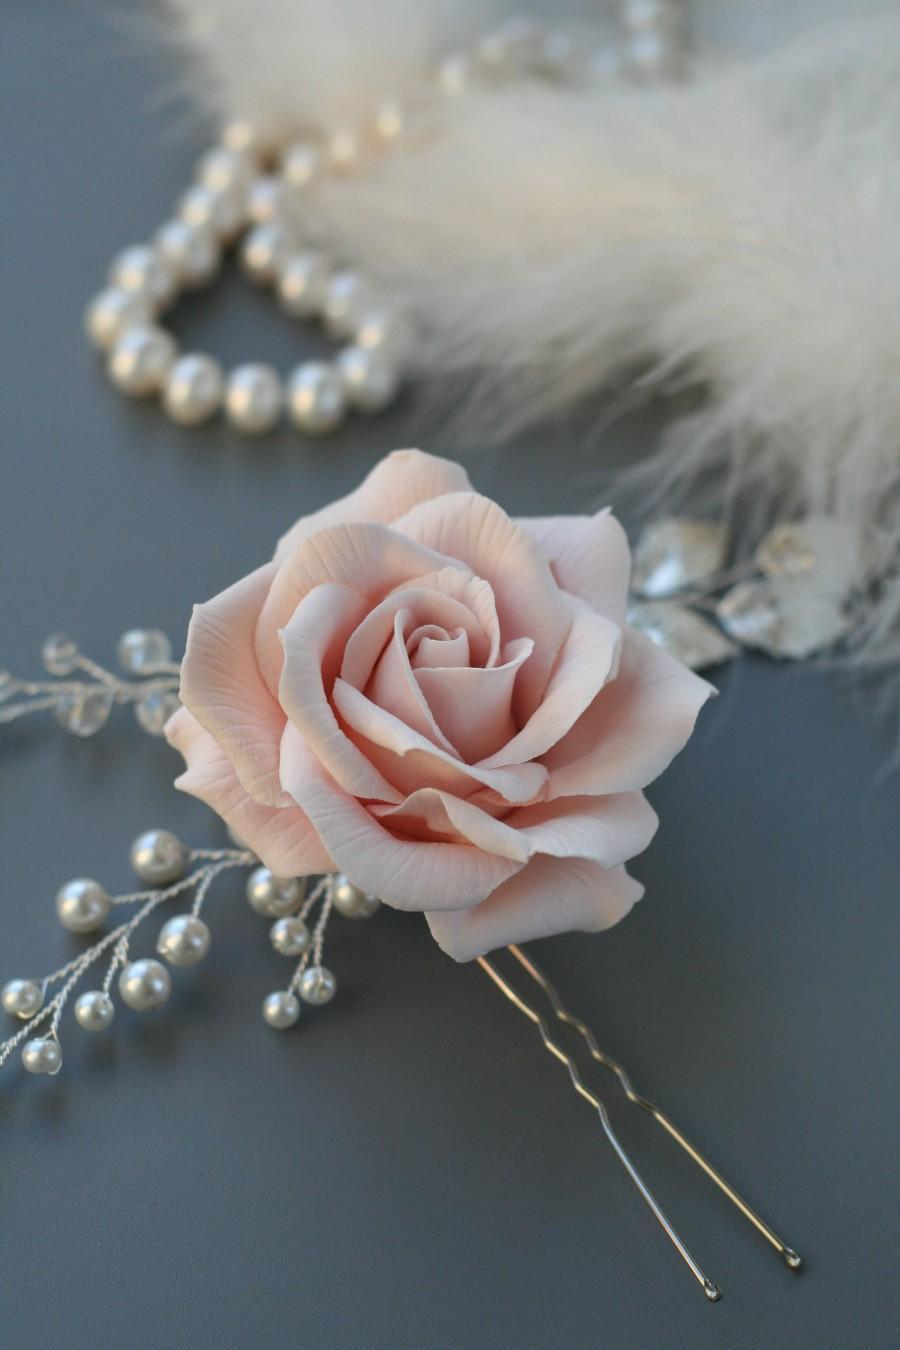 Wedding - Blush Rose Bridal hair flower, Flower Bridal hair pin, Blush Wedding hair flower, Wedding hair pin, Rose hair pin, Bridal hair accessories - $40.00 USD